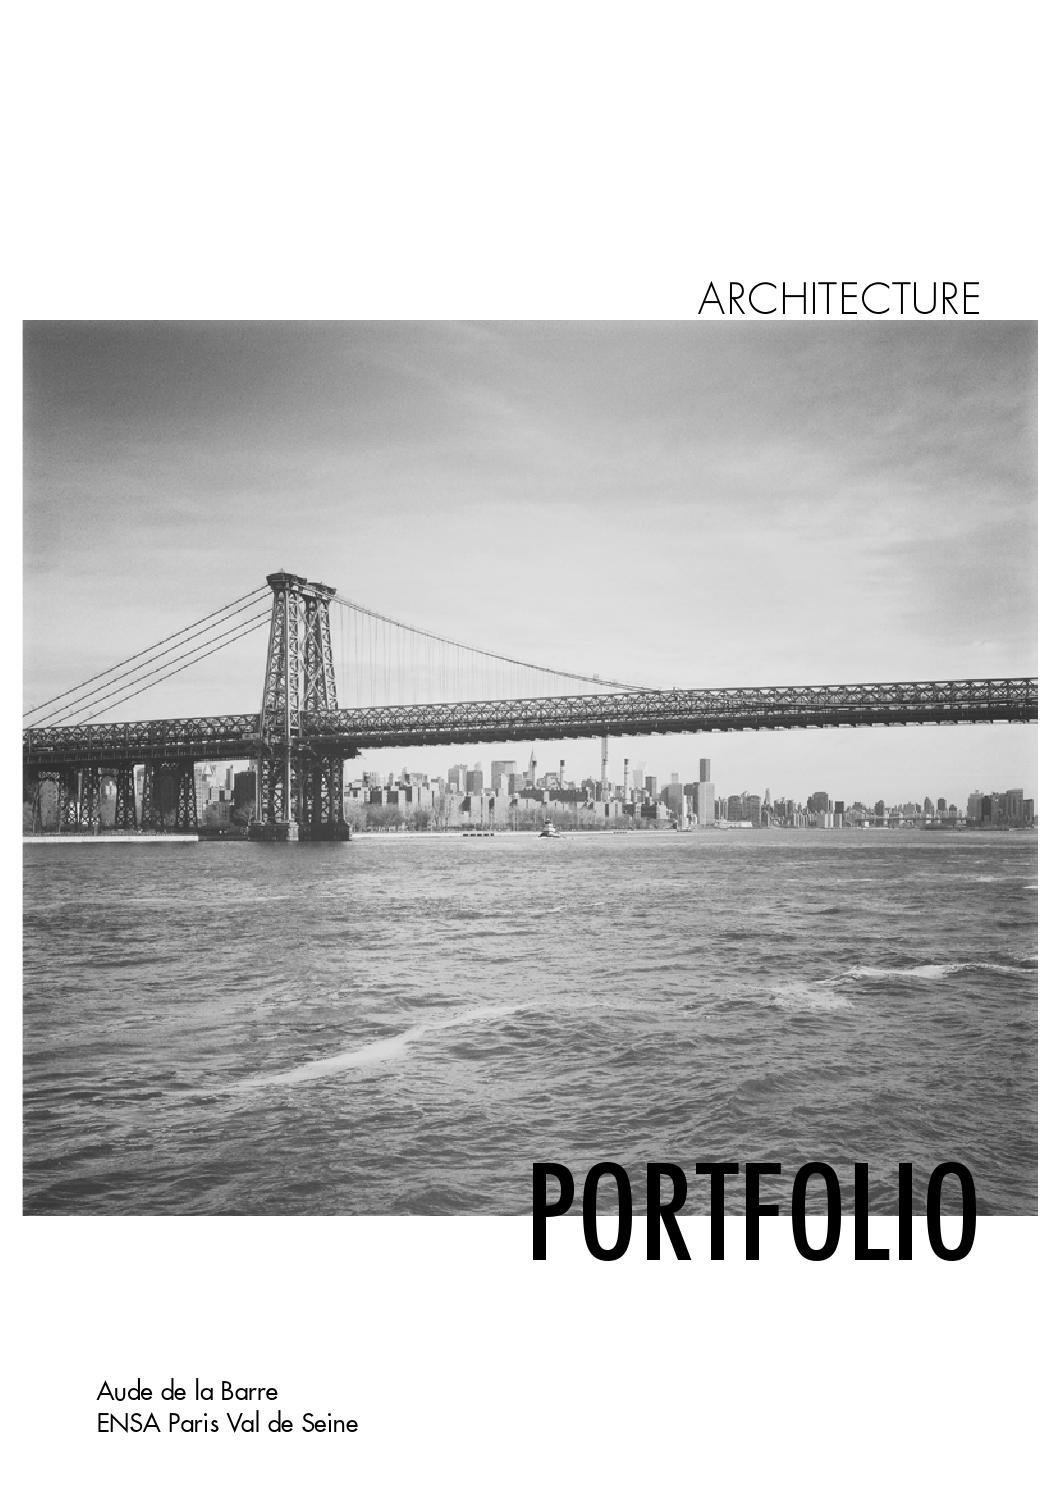 architecture student portfolio aude de la barre by aude de la barre issuu. Black Bedroom Furniture Sets. Home Design Ideas